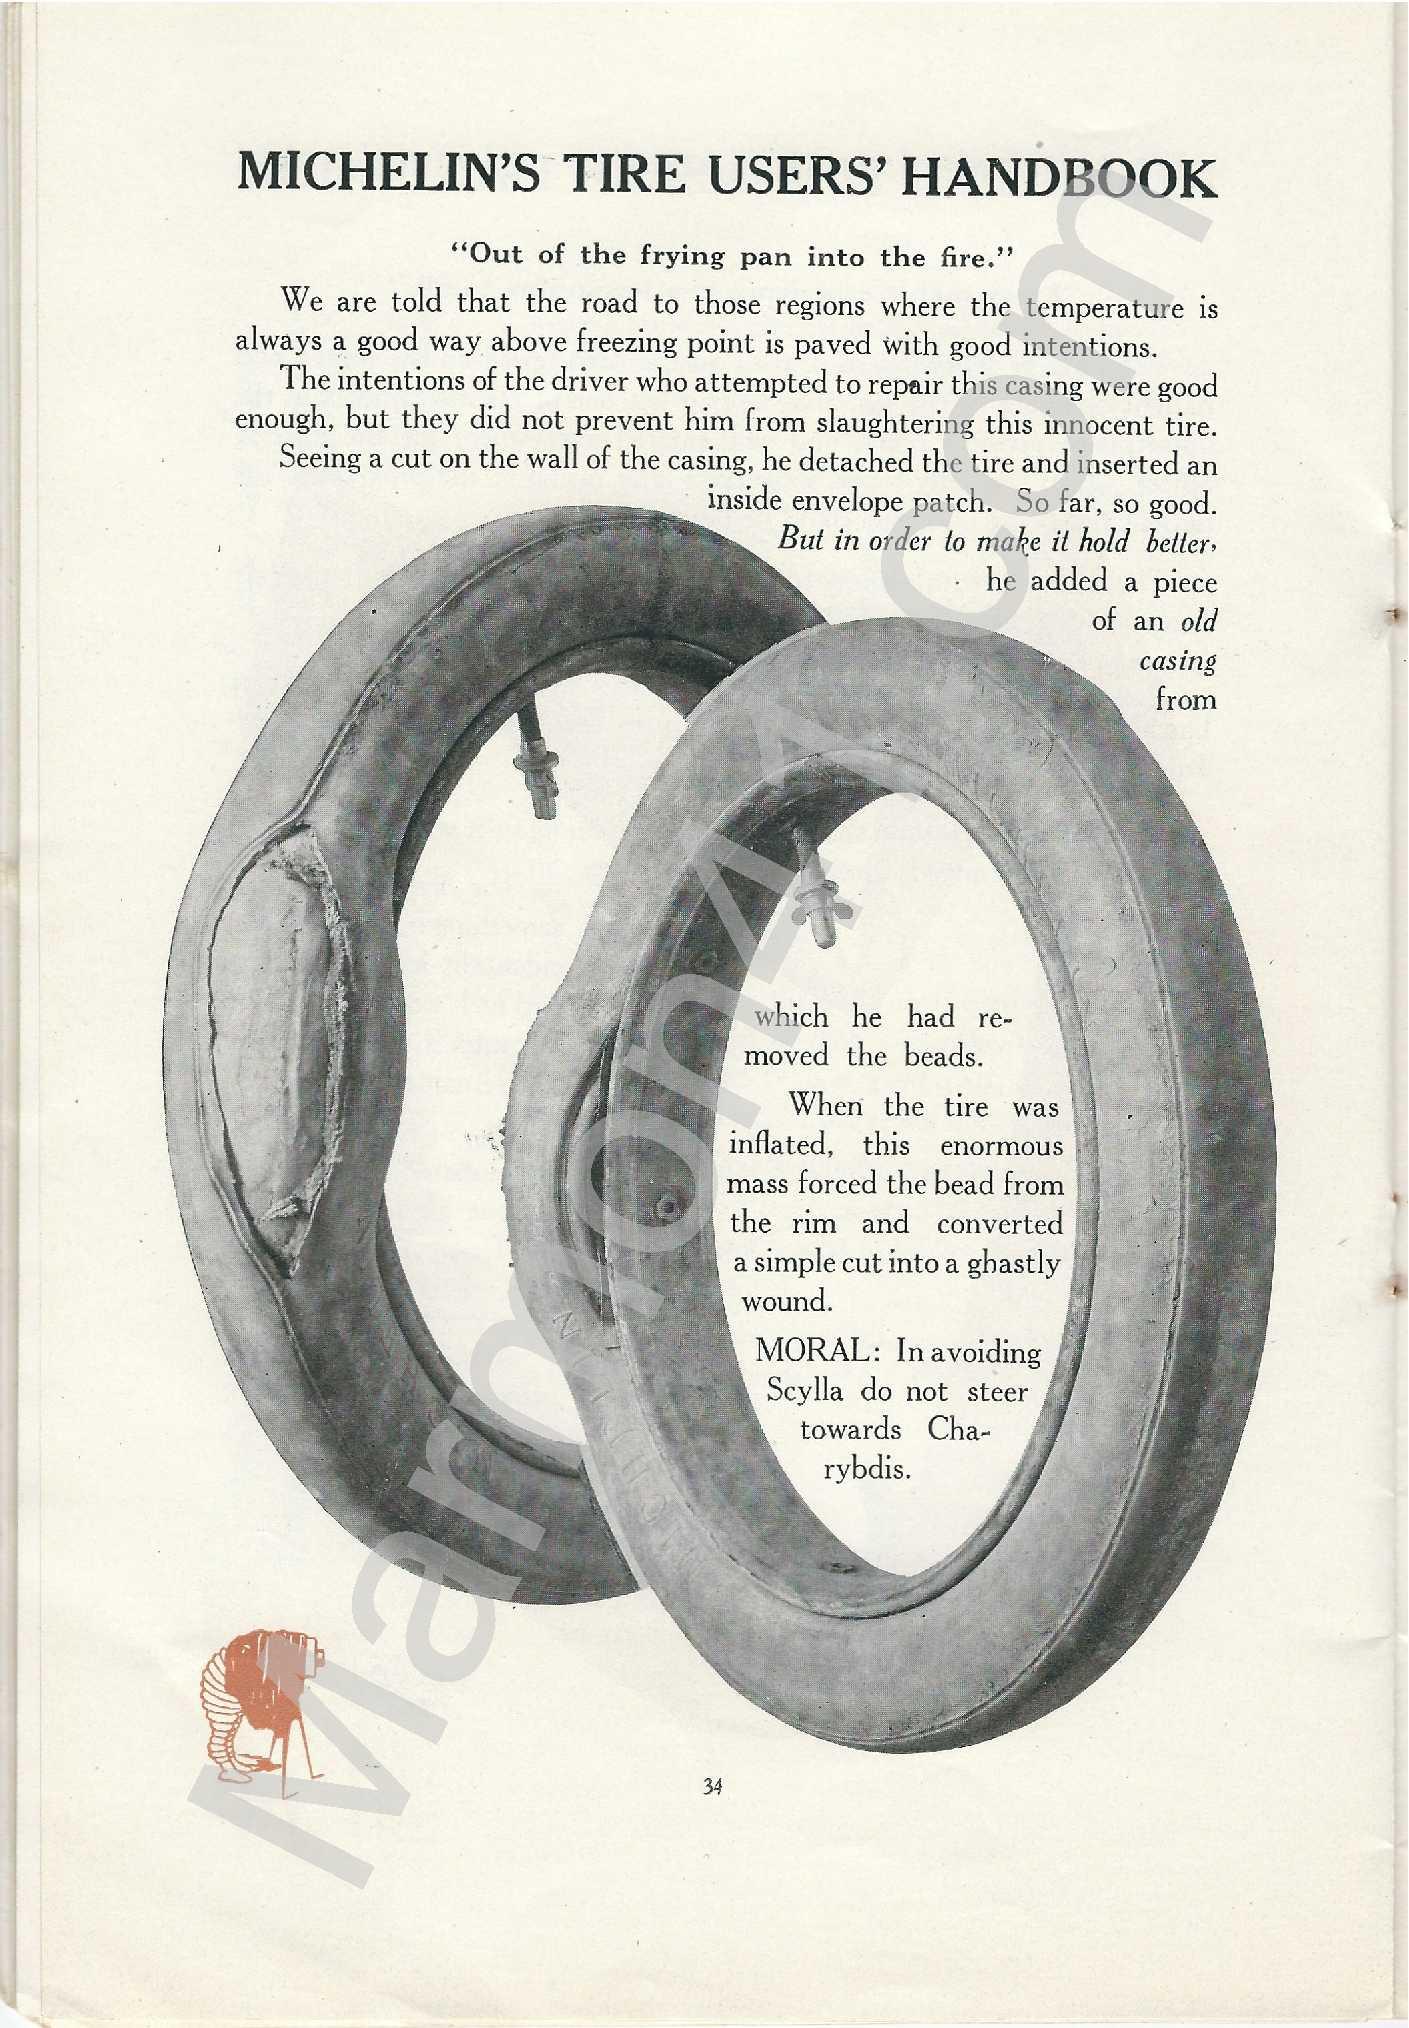 Michelins Tire Users Handbook_34